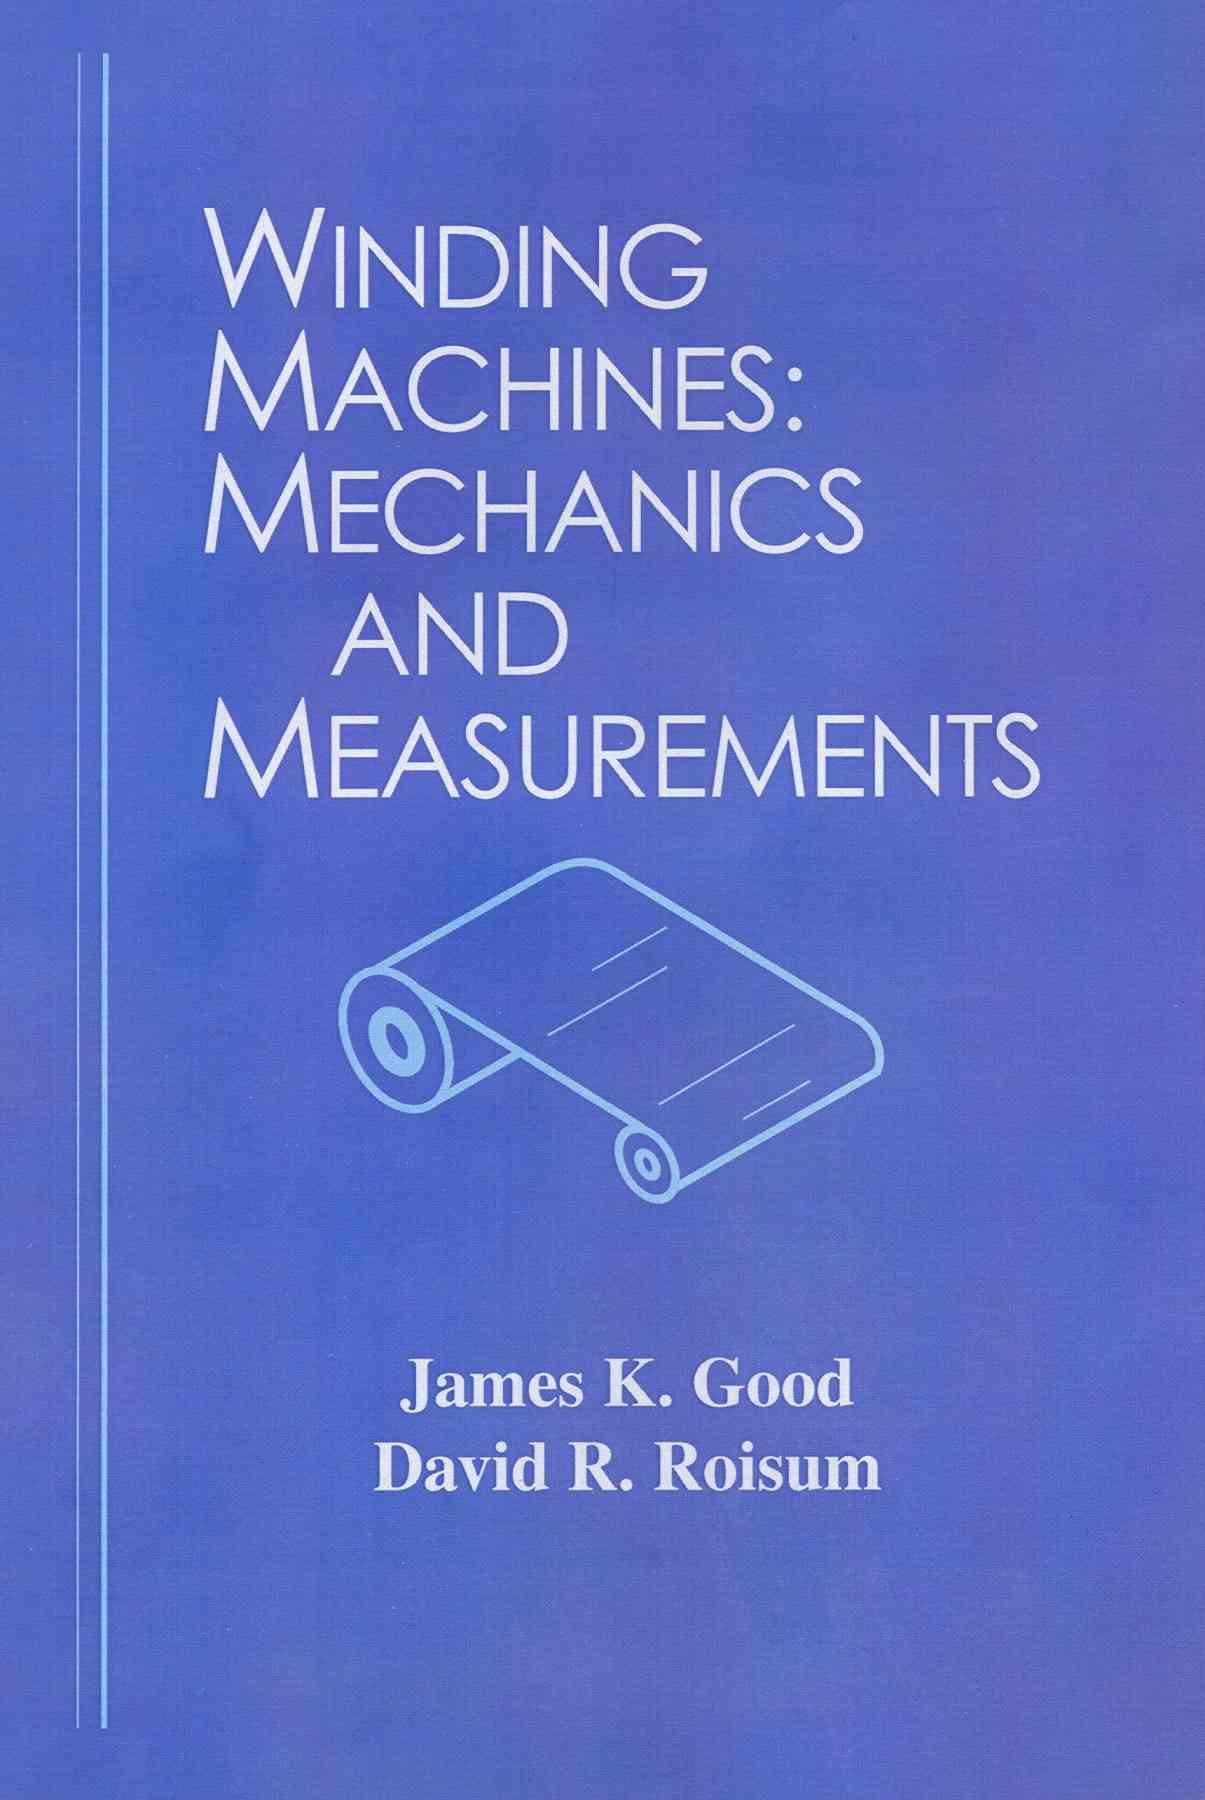 Winding By Good, James K., Ph.D./ Roisum, David R.